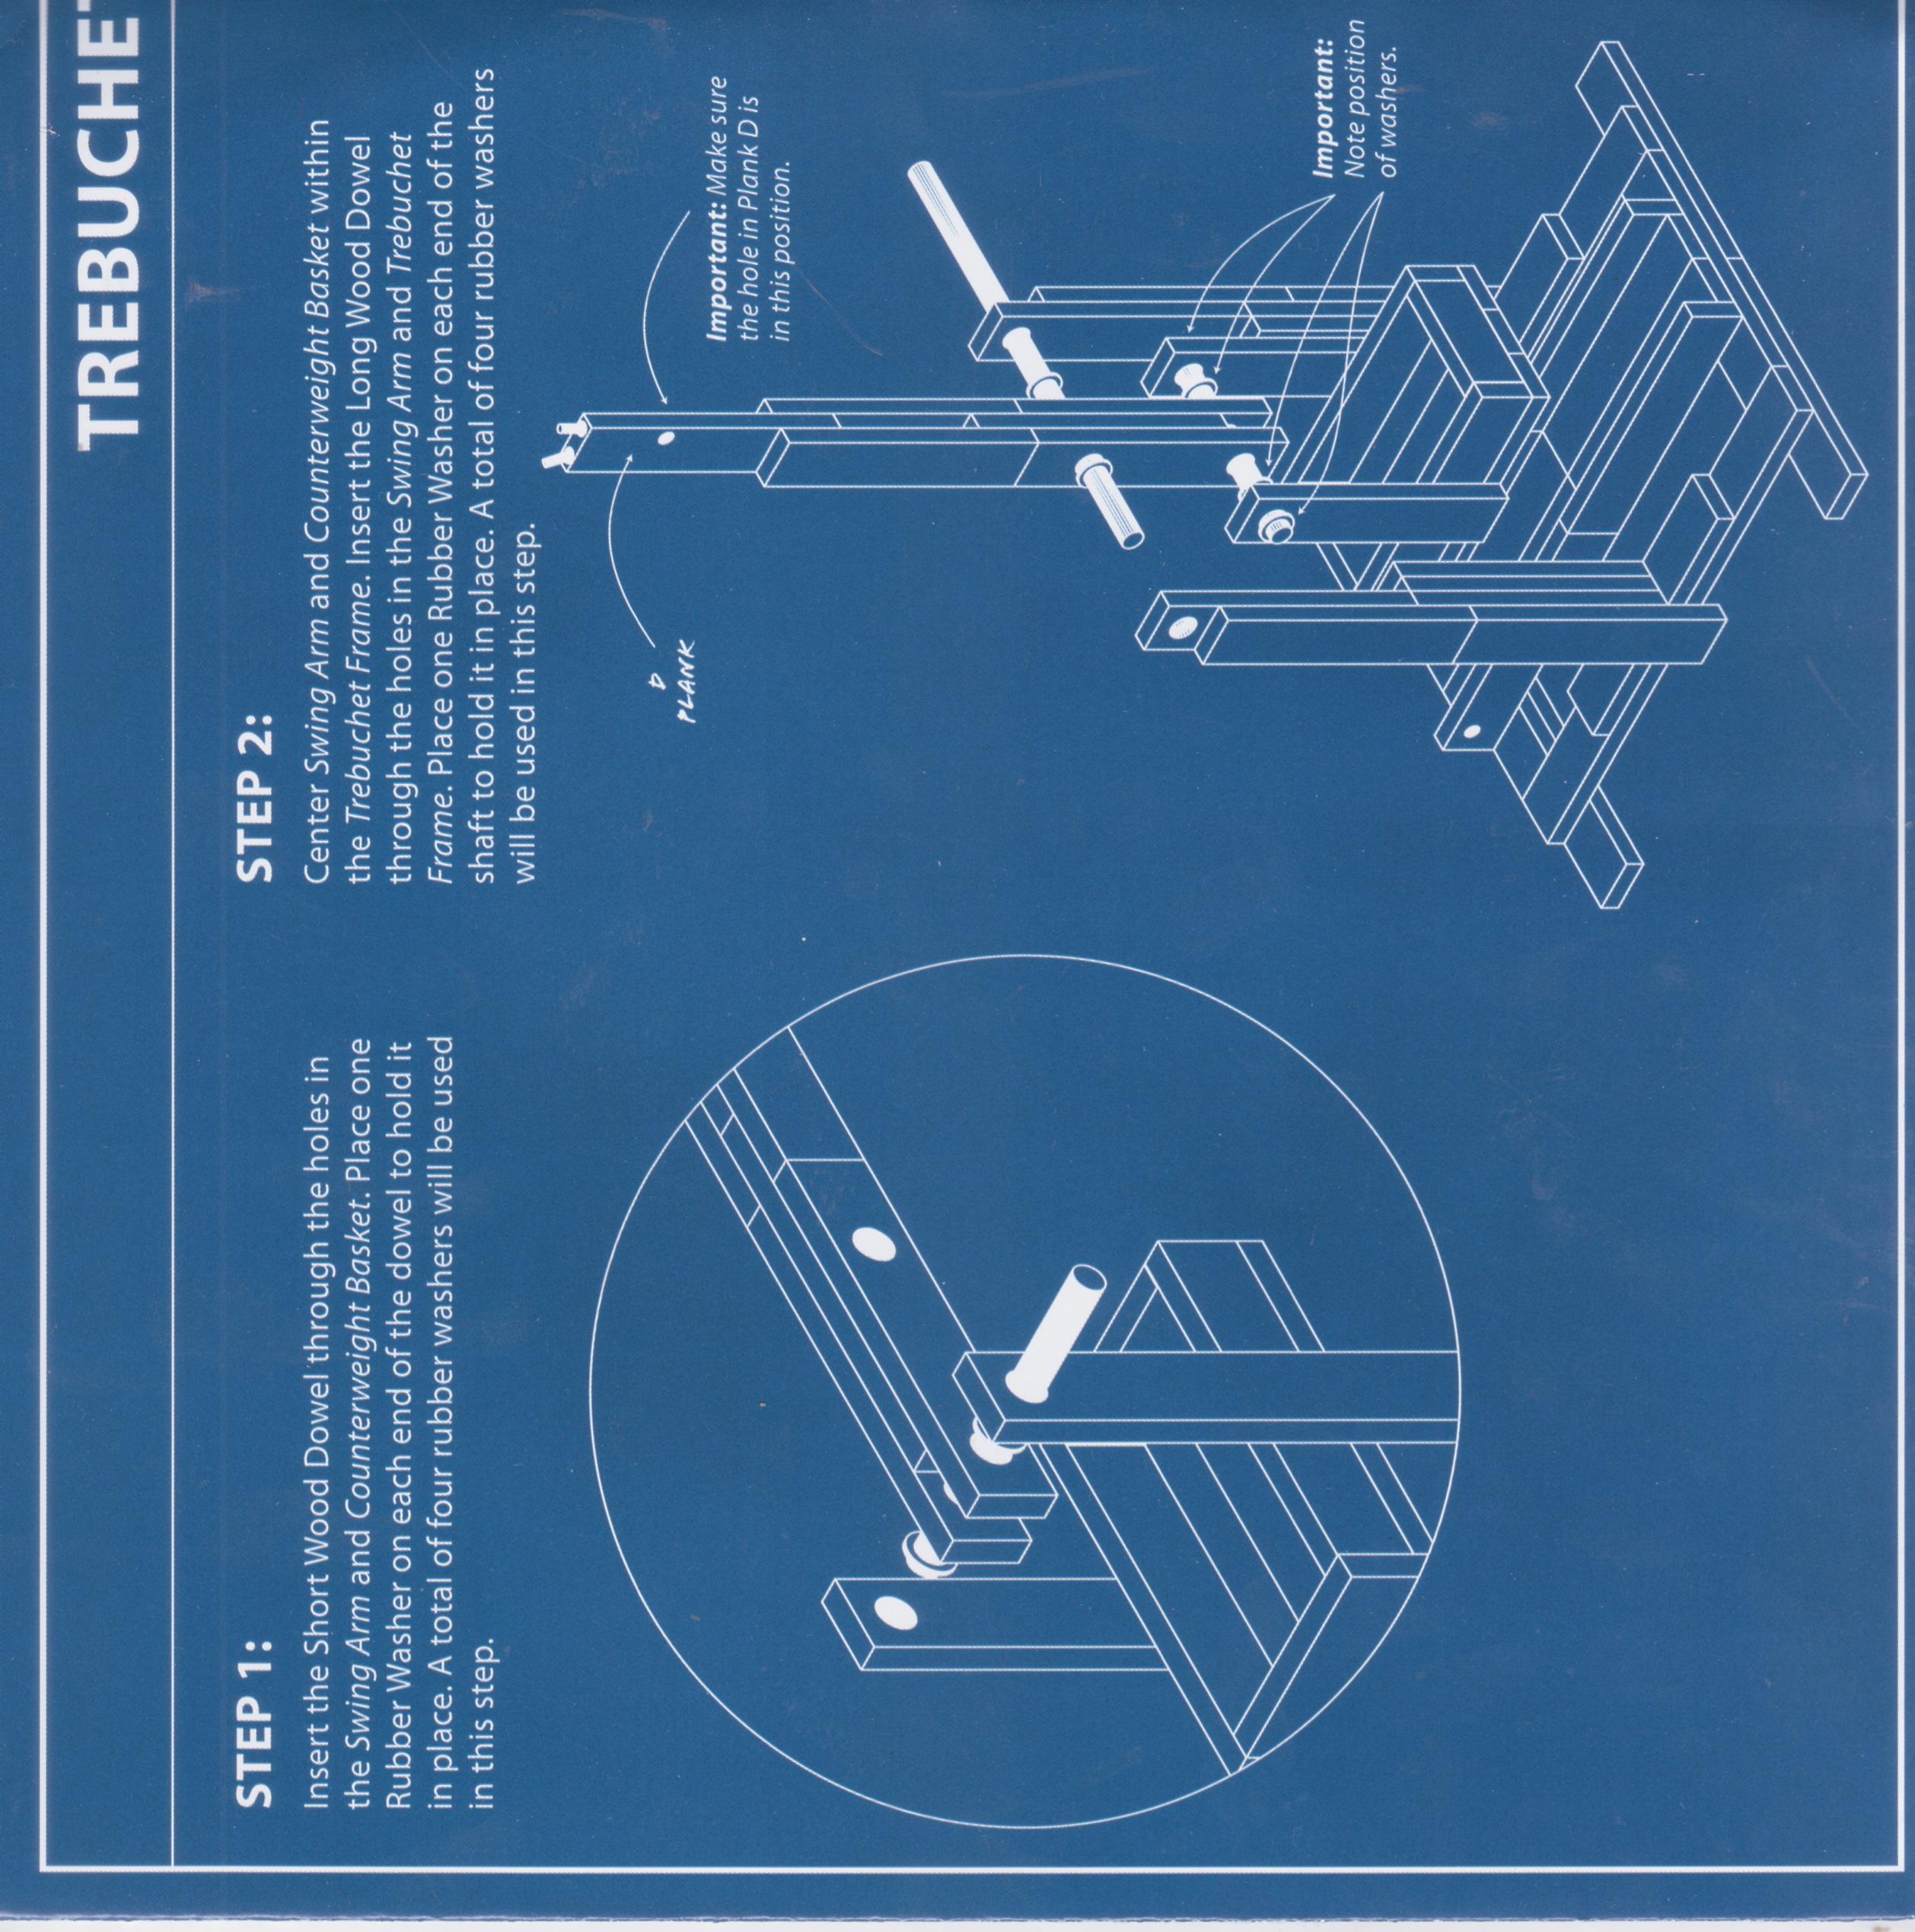 Catapult Blueprints www imgkid com - The Image Kid Has It!